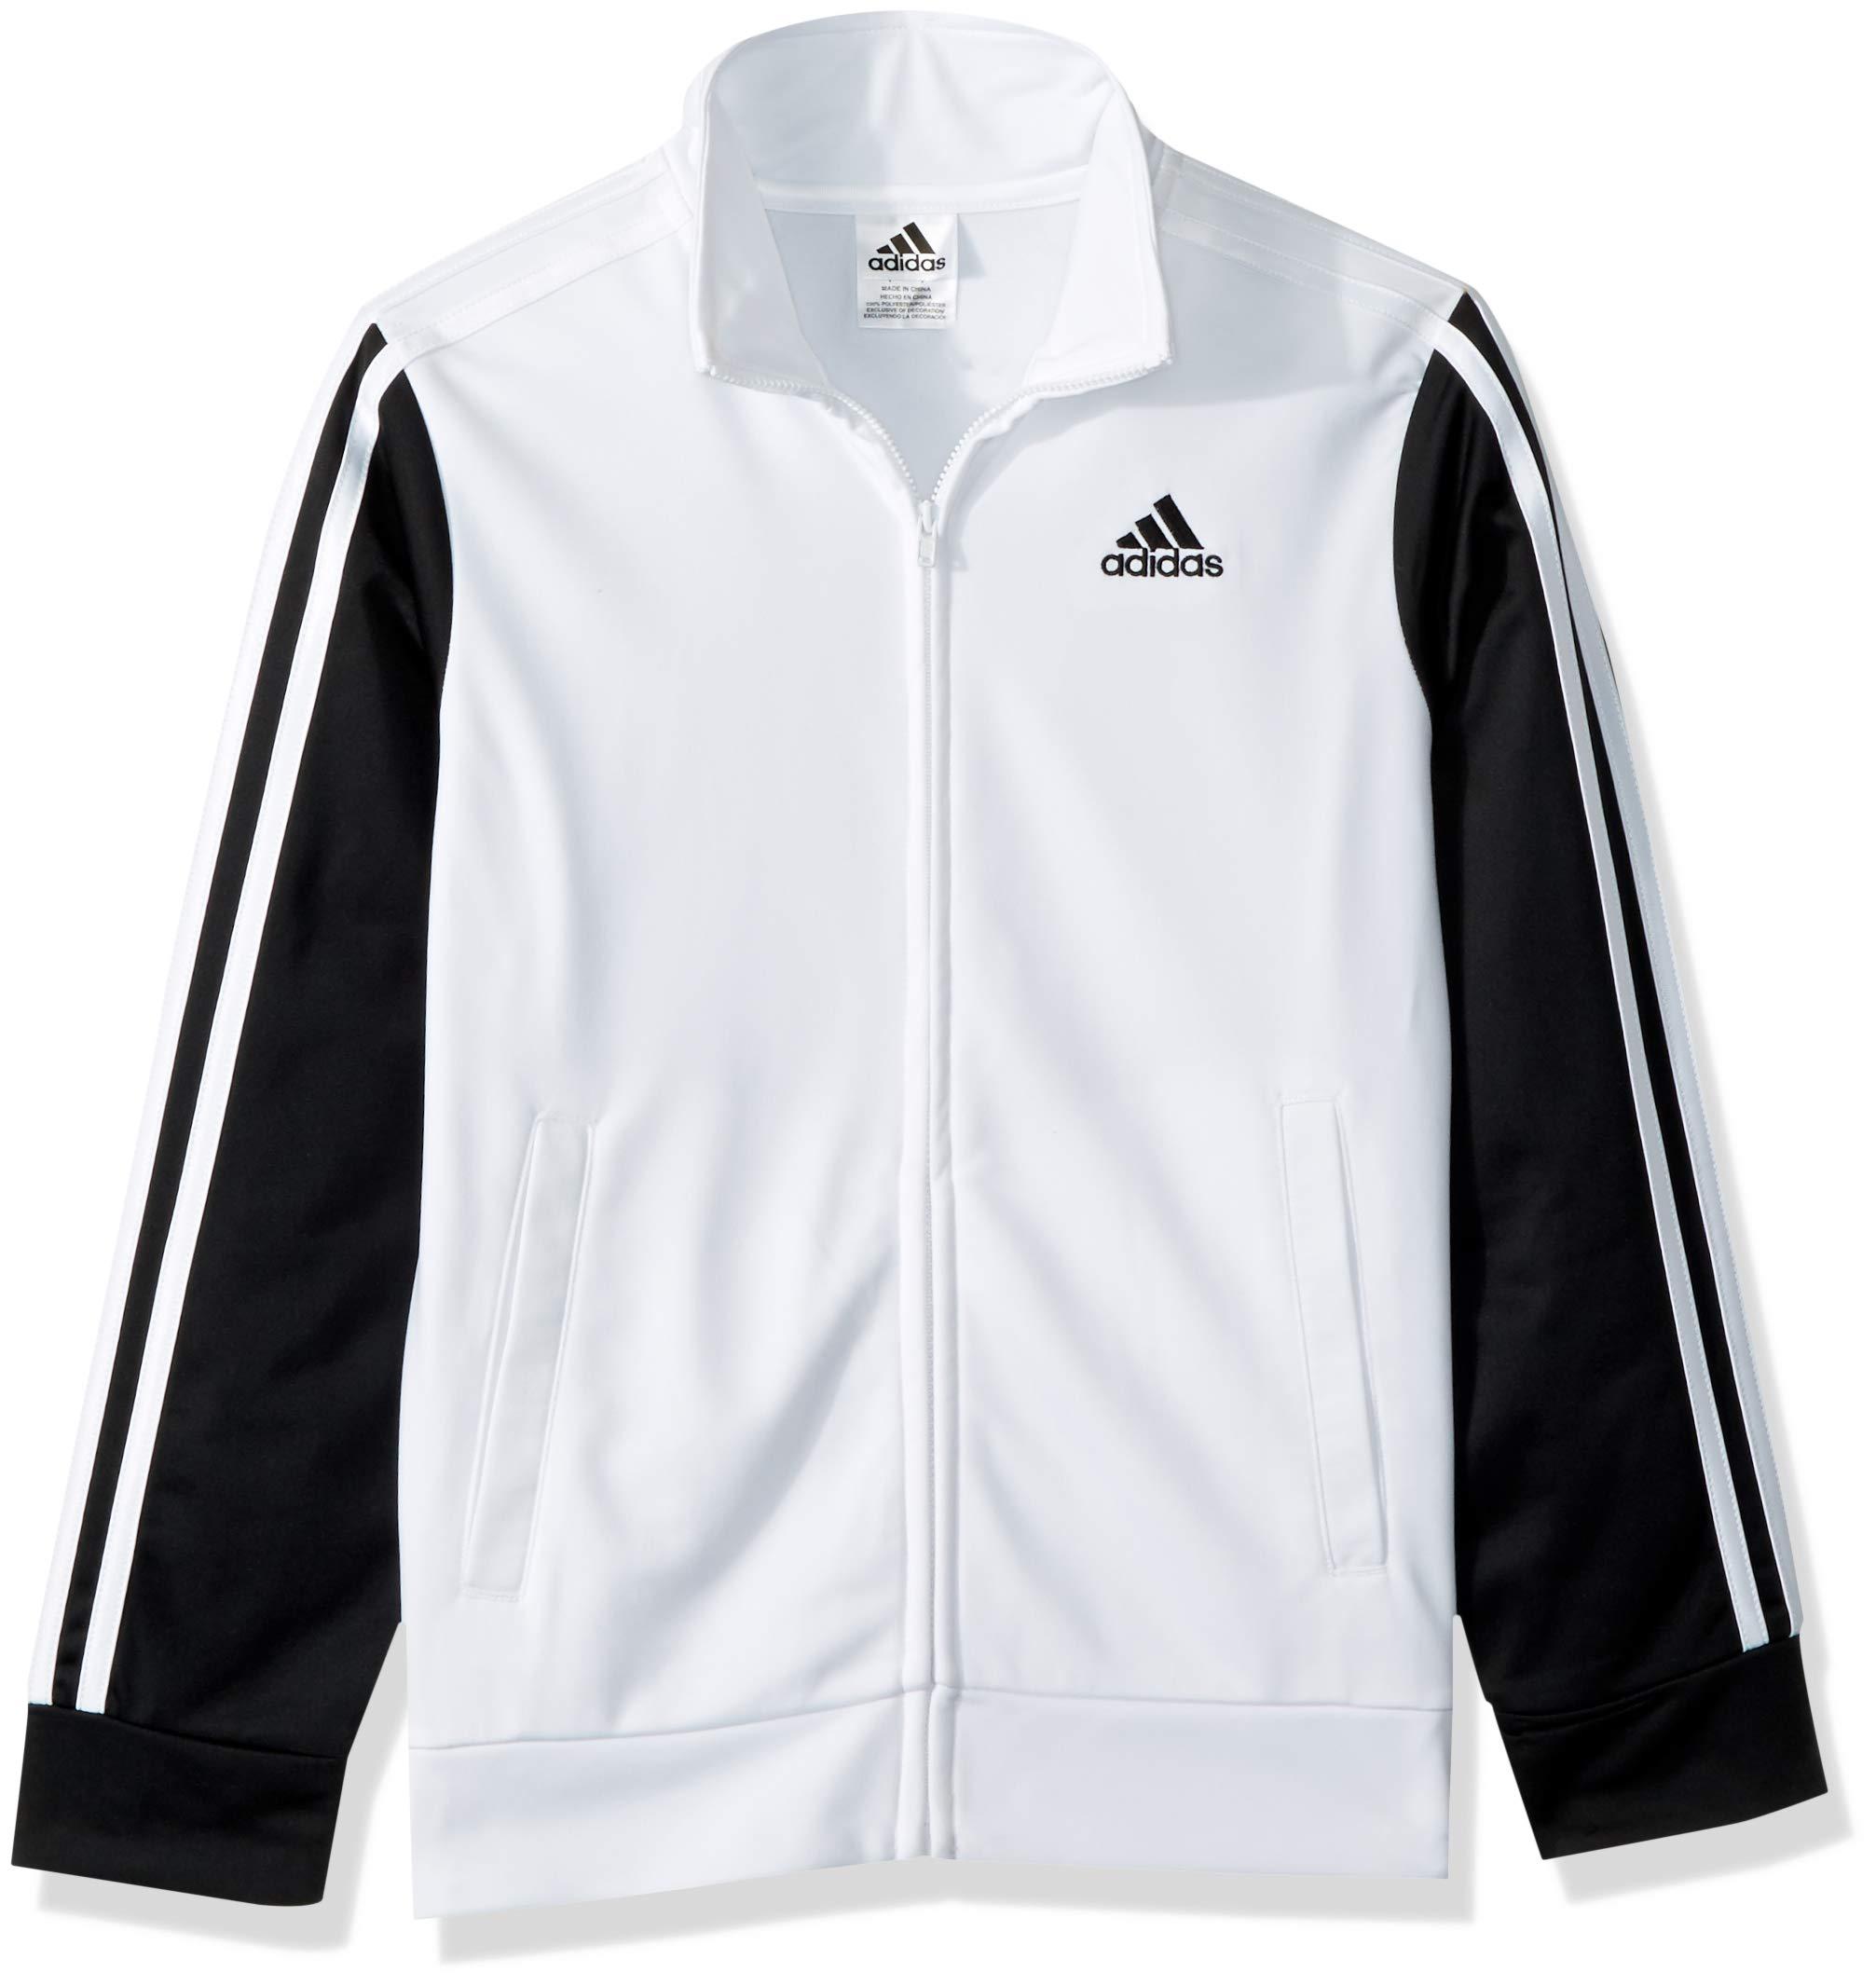 adidas Boys' Big Tiro and Tricot Jackets, White, S(8)